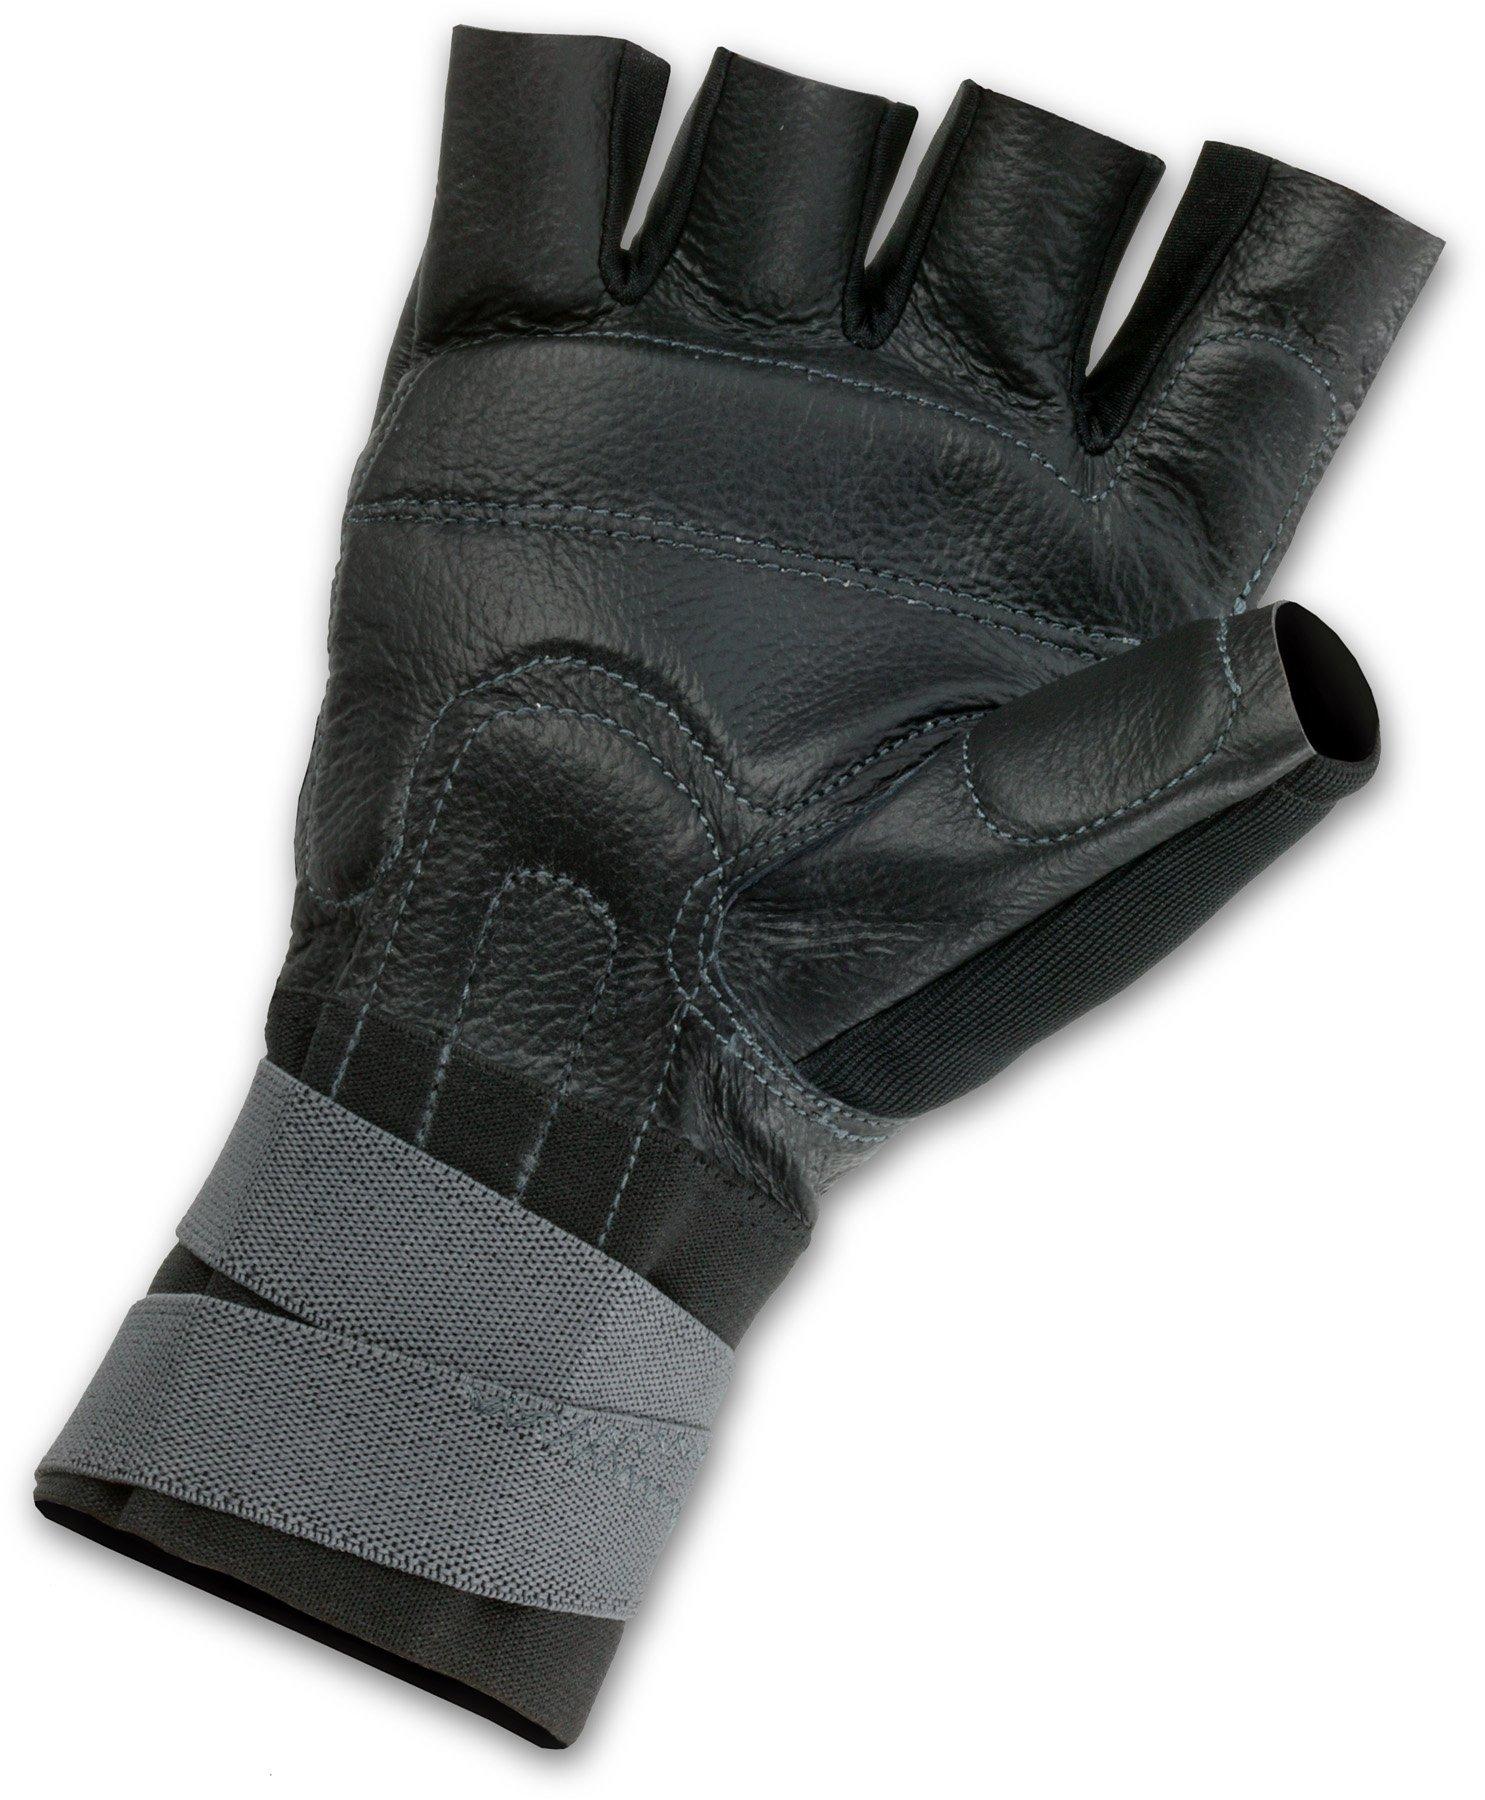 Ergodyne ProFlex 910 Impact Protection Work Glove with Wrist Support, Black, Large